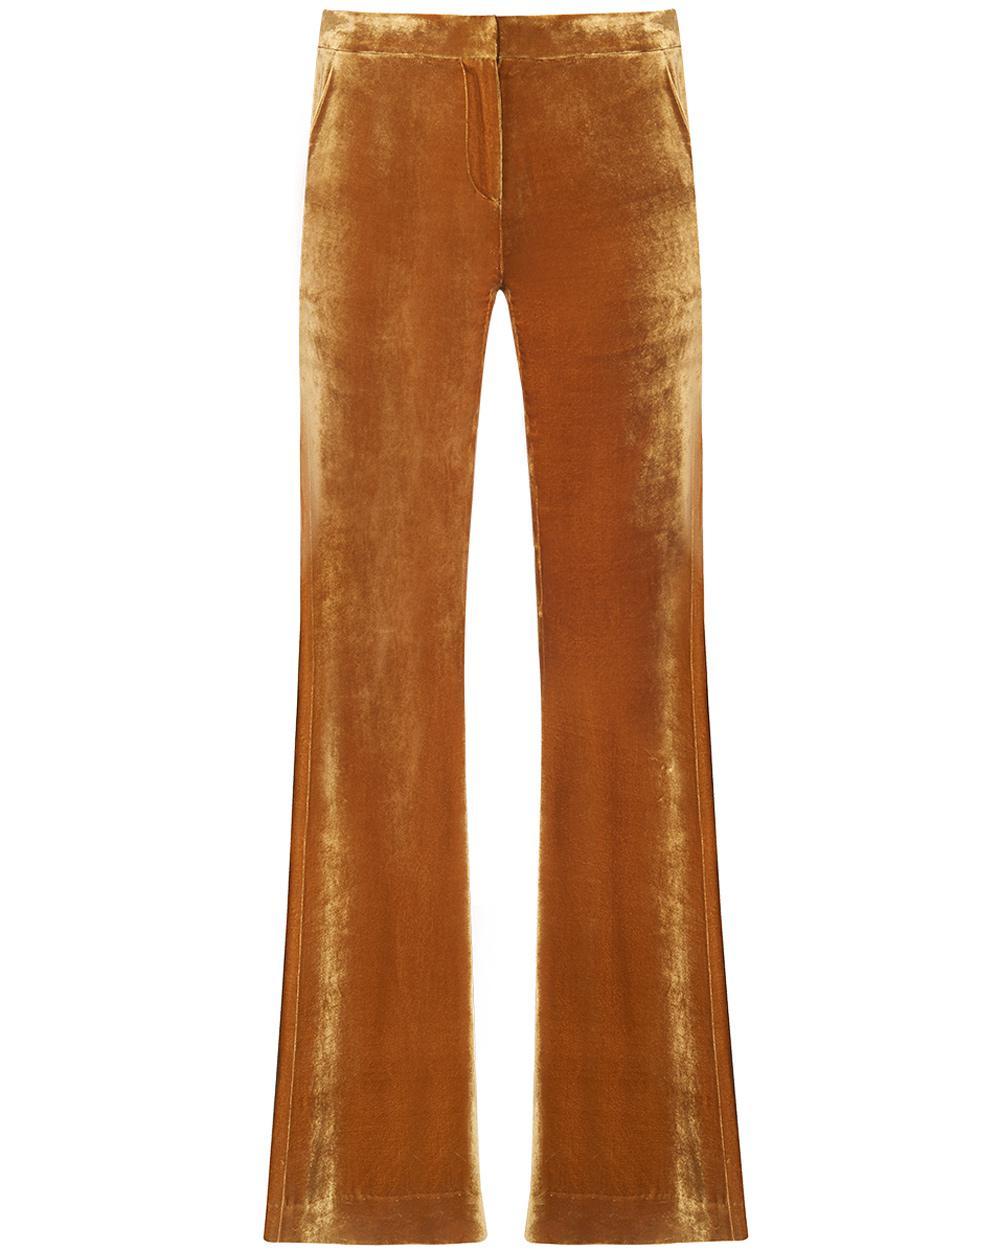 cbfc65f4a26b Lyst - Veronica Beard Ramsey Tux Pant in Brown